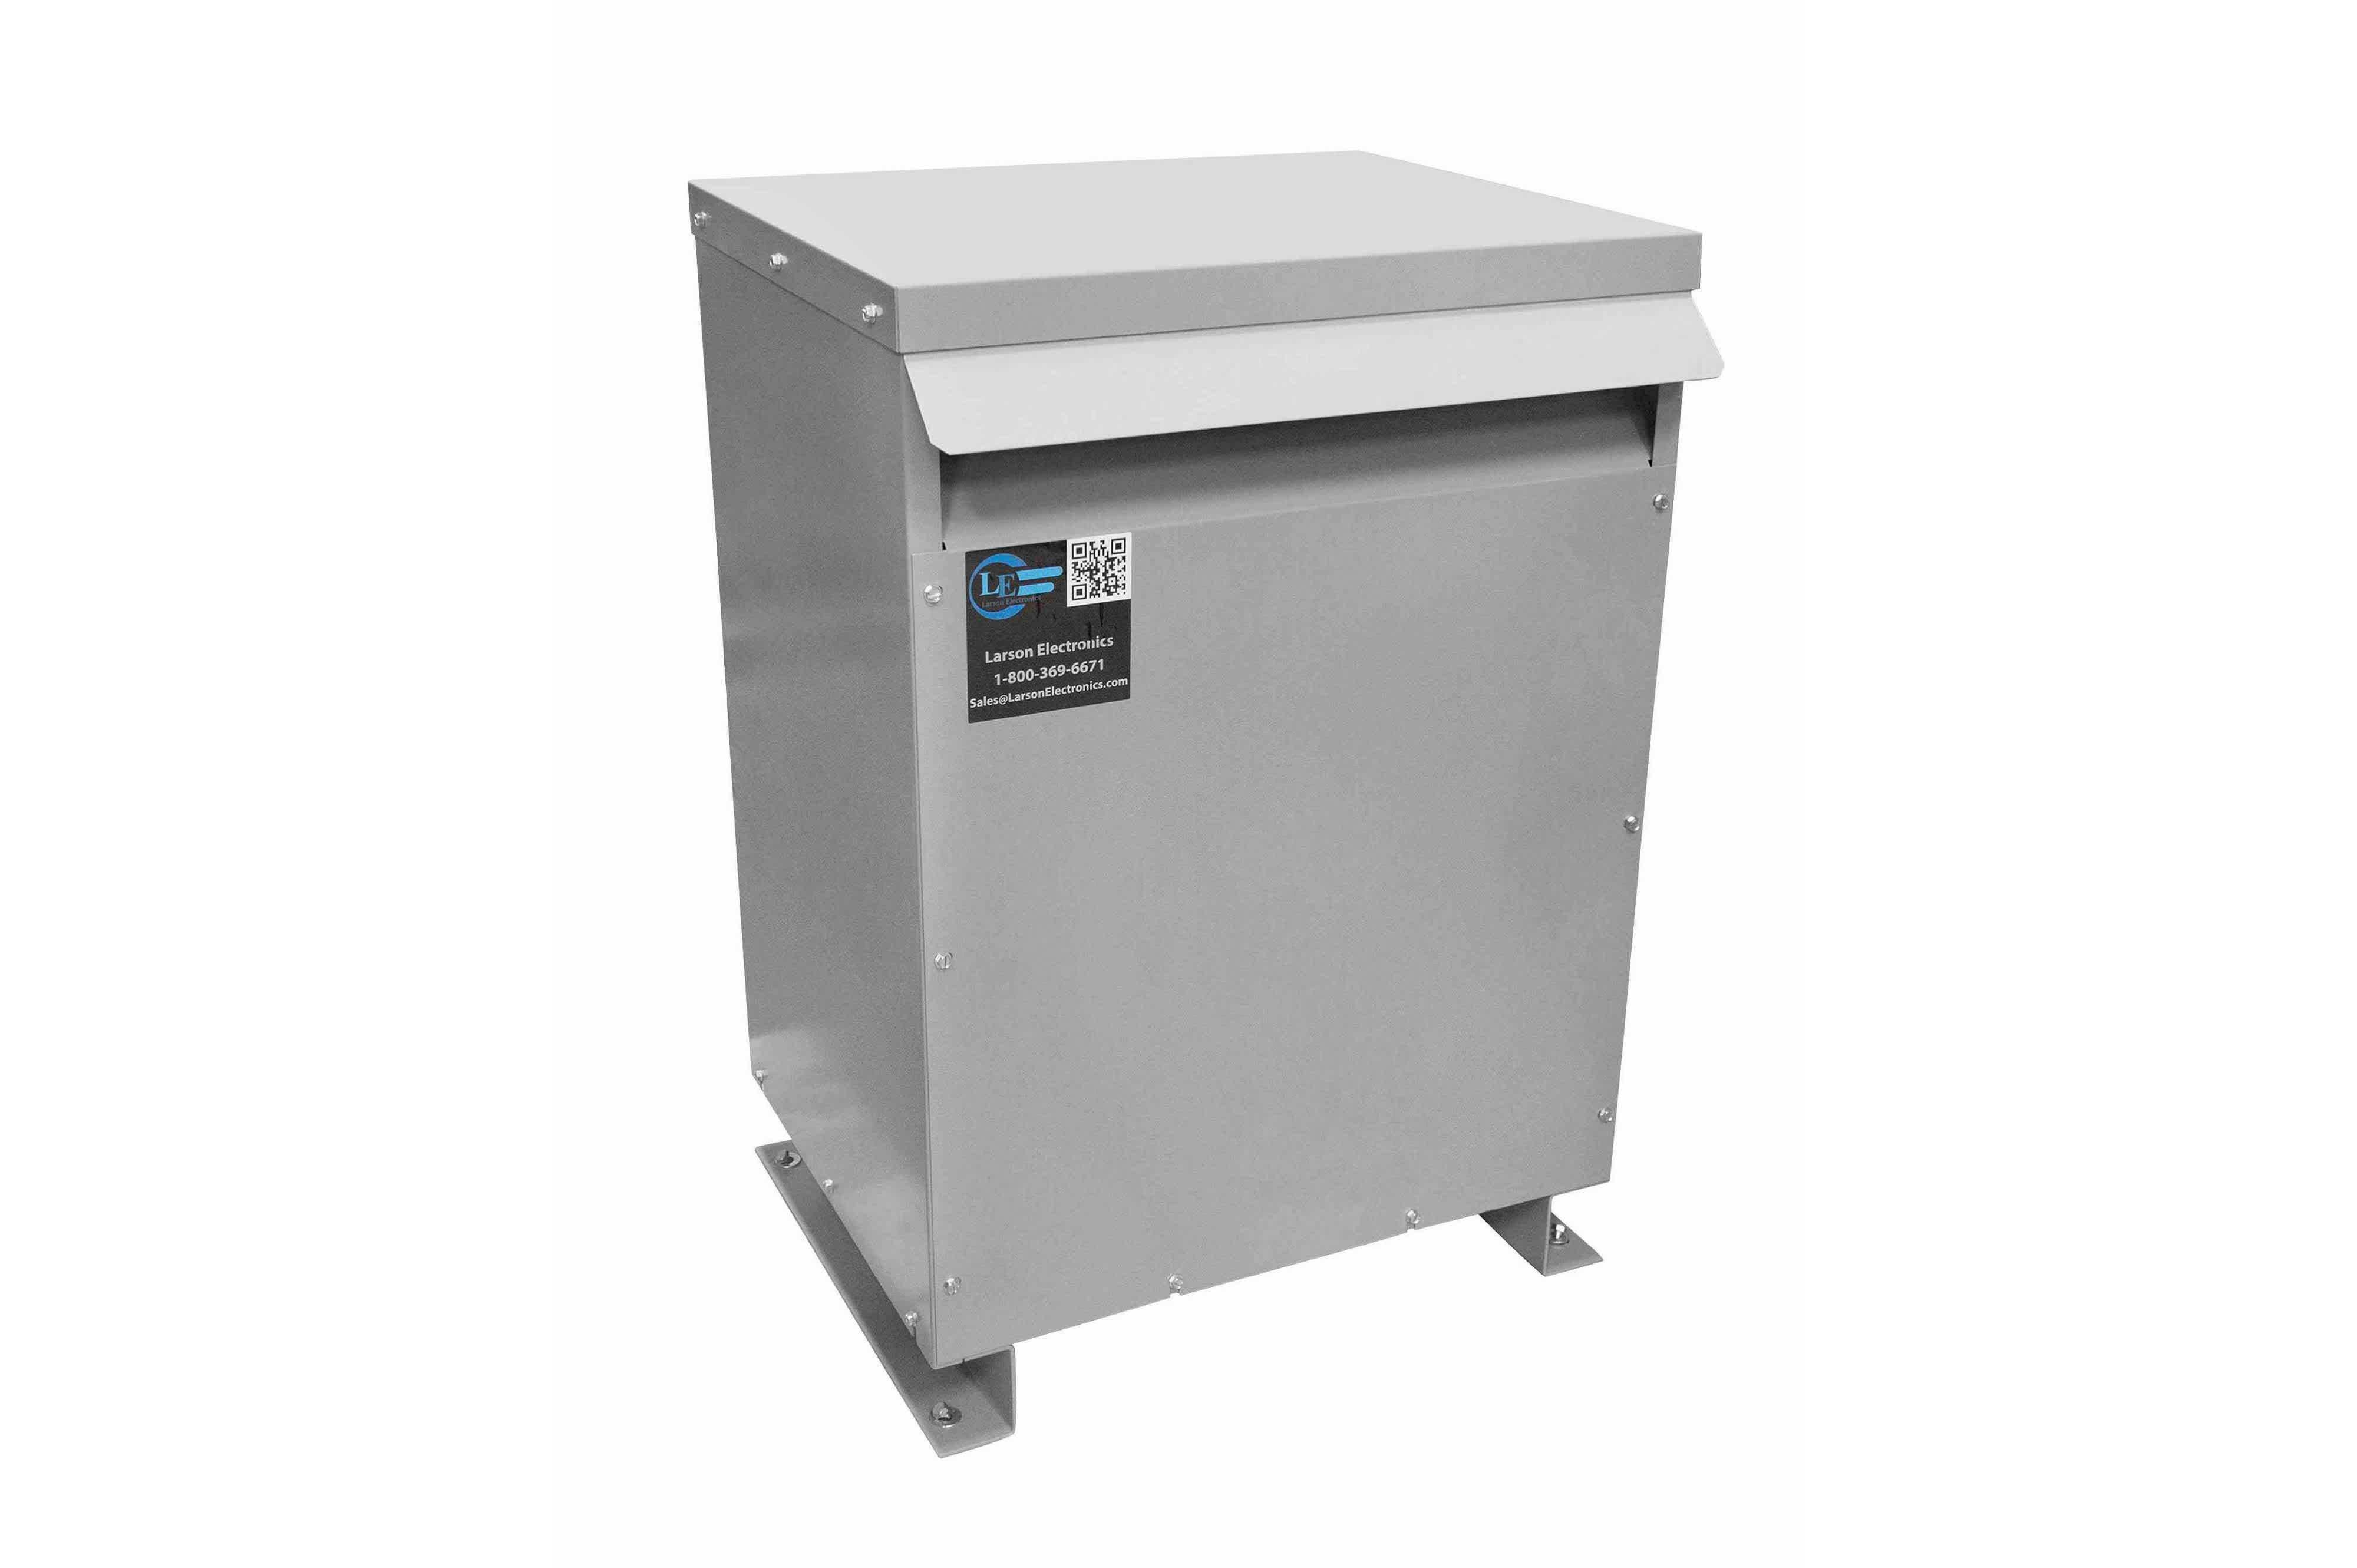 29 kVA 3PH Isolation Transformer, 240V Wye Primary, 400V Delta Secondary, N3R, Ventilated, 60 Hz